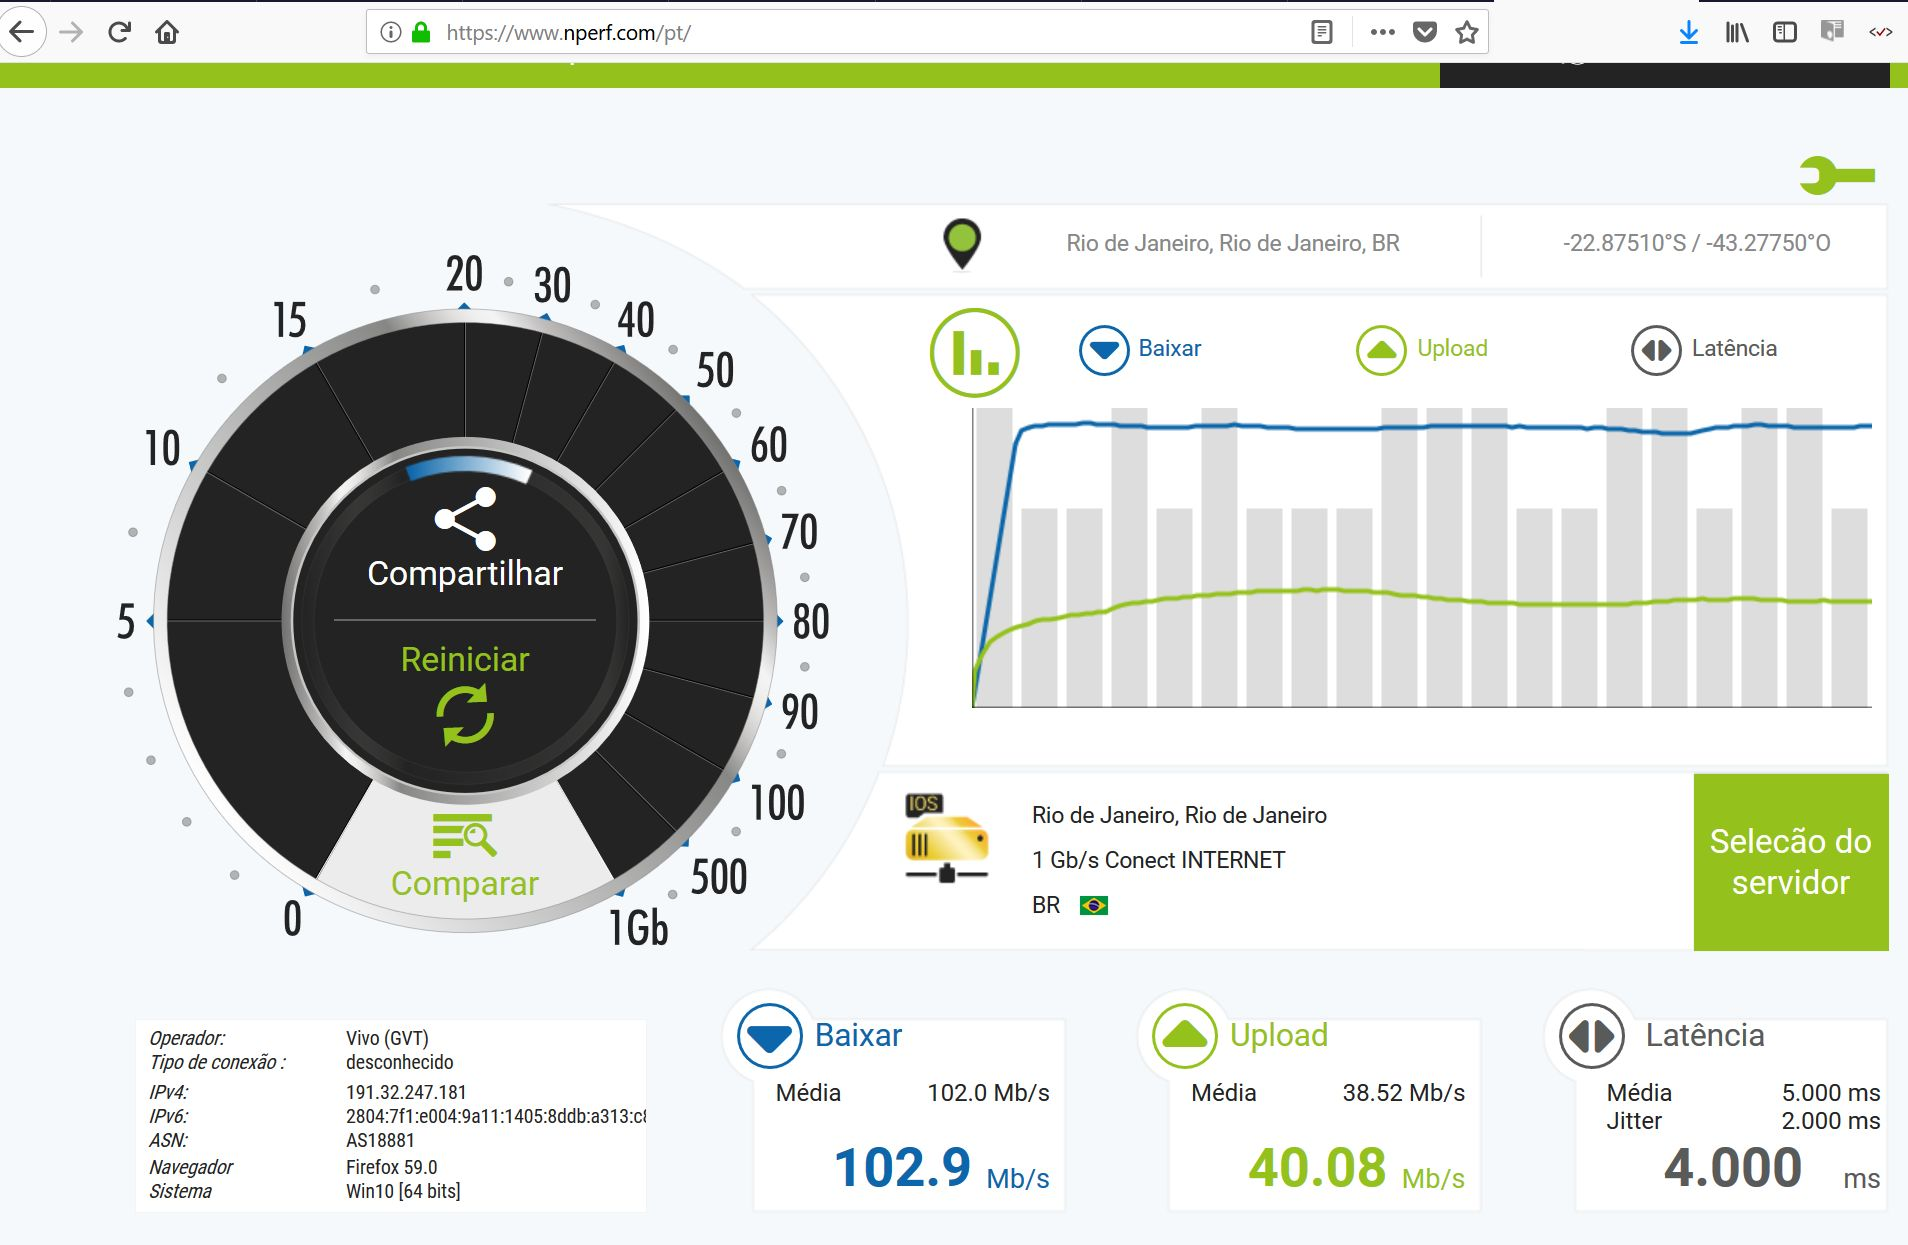 teste de velocidade nperf Vivo Fibra 100 megas RJ